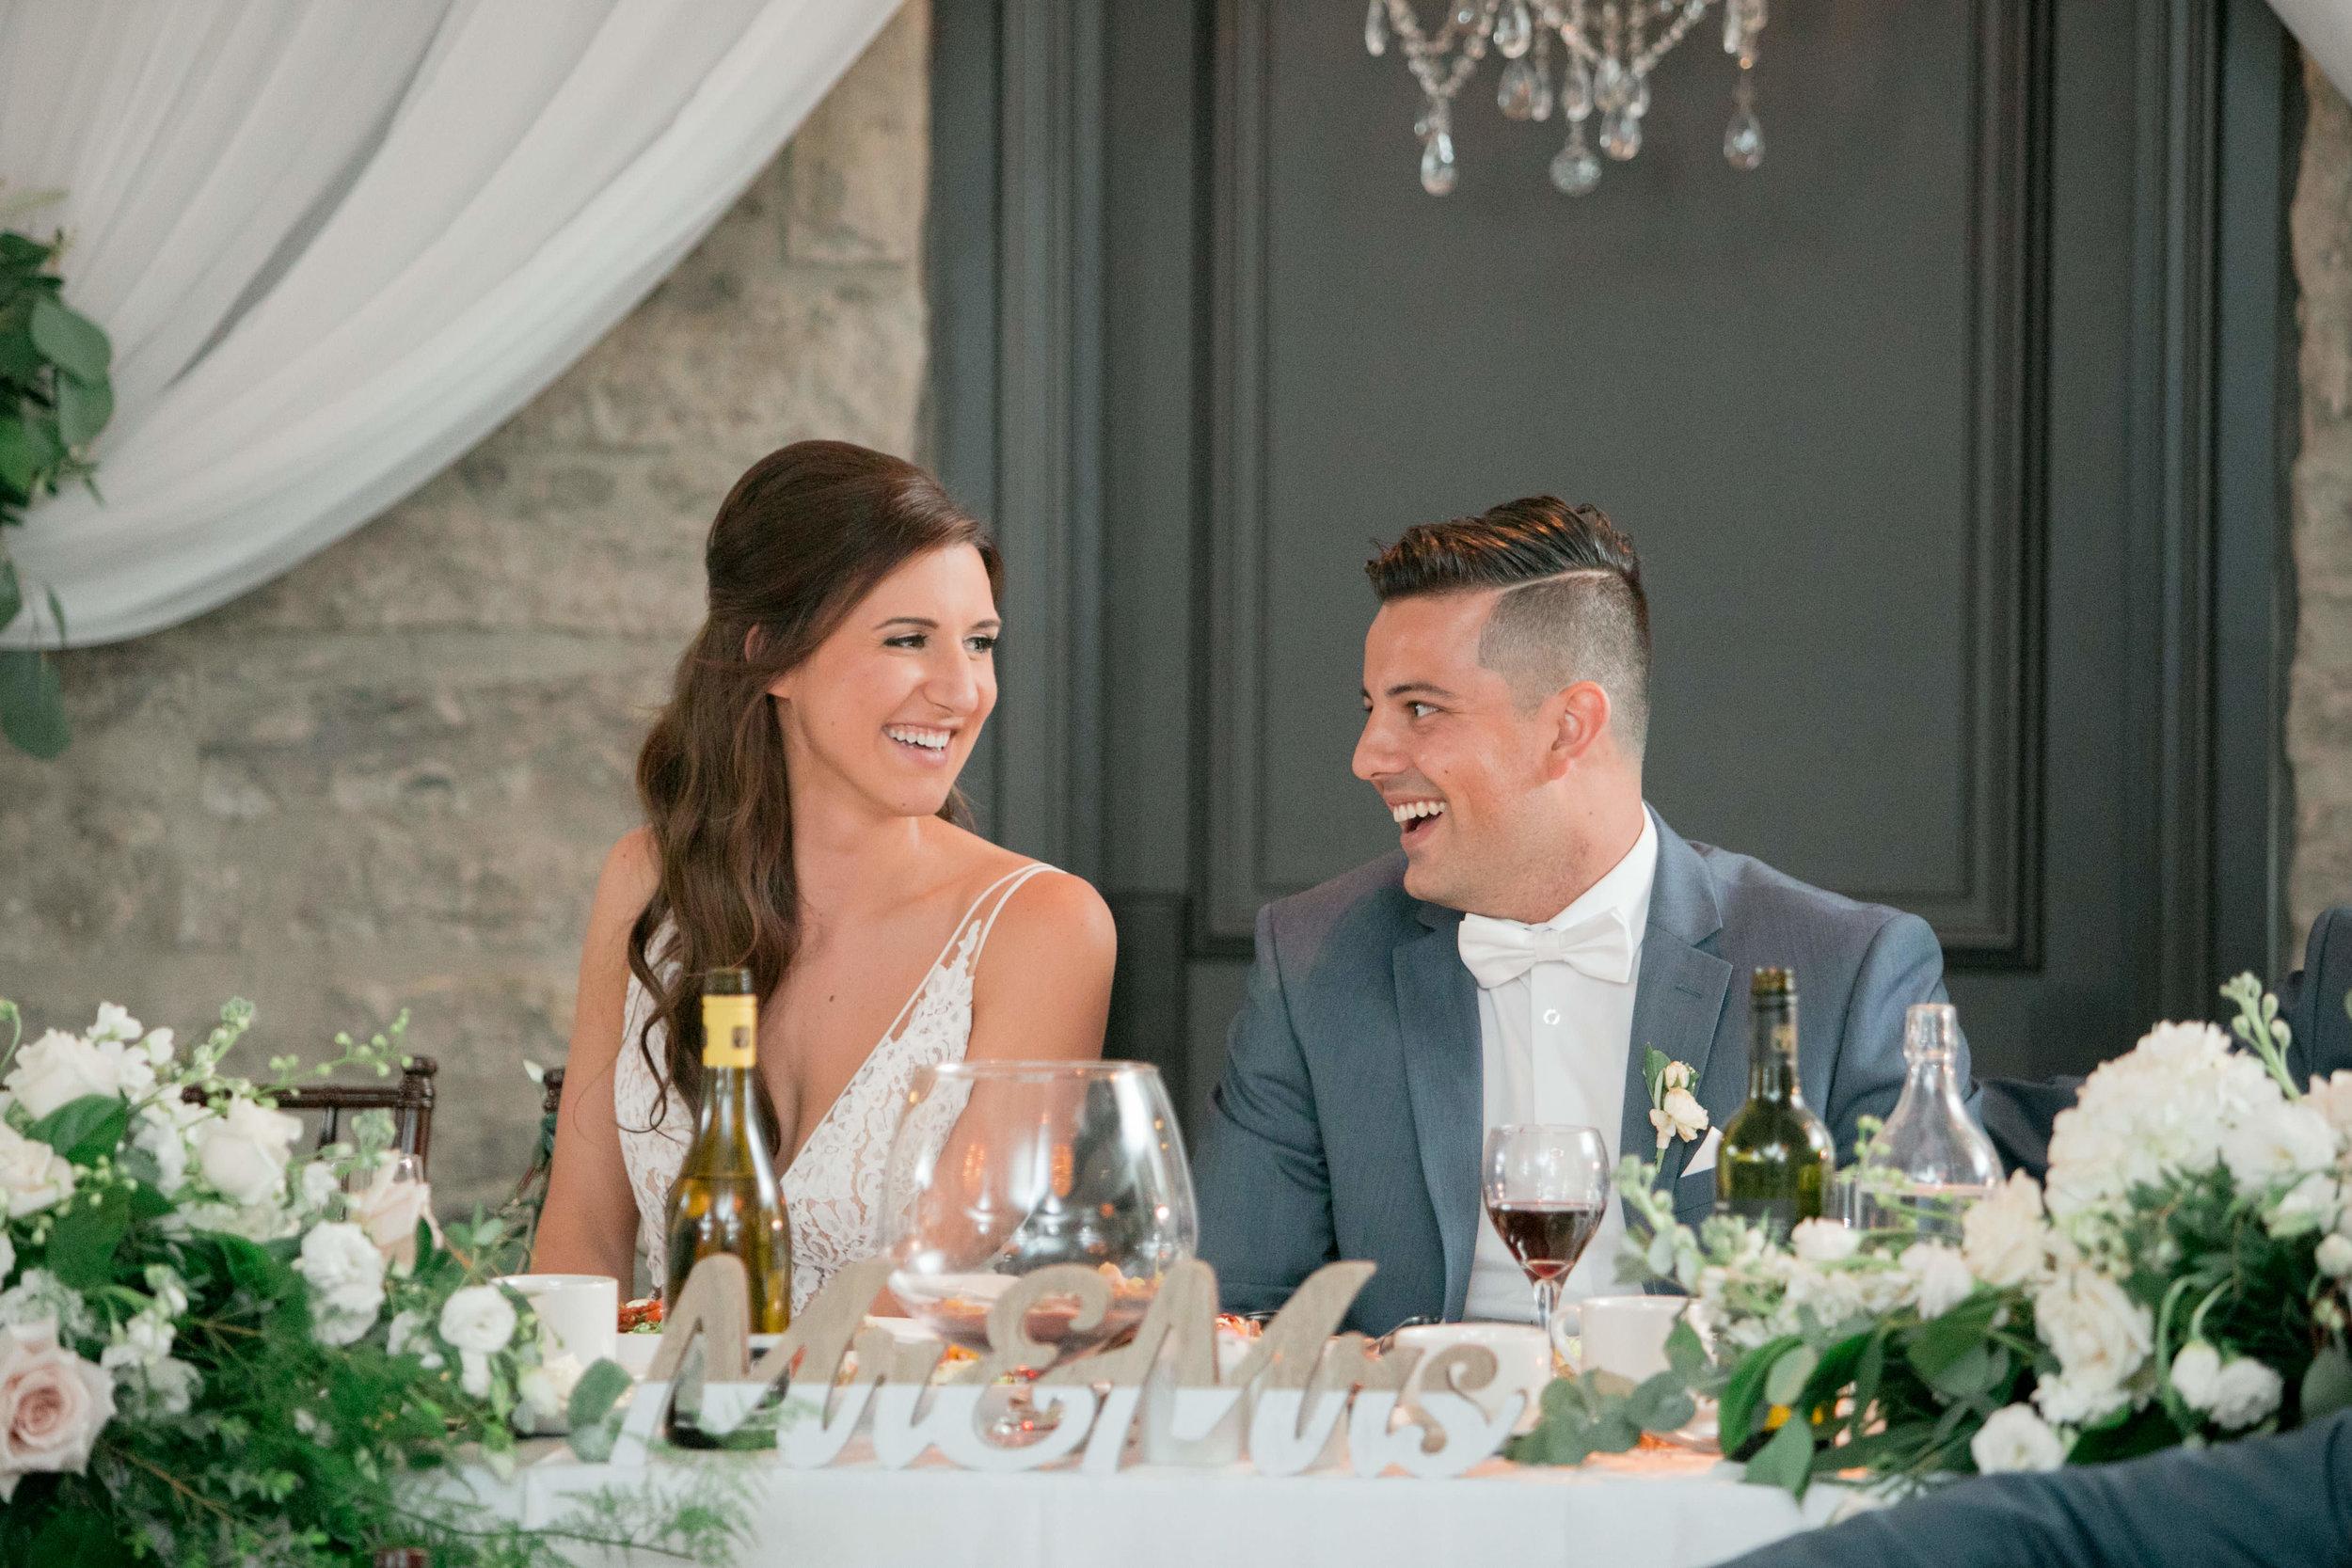 Miranda___Daniel___Daniel_Ricci_Weddings___High_Res._Finals_577.jpg